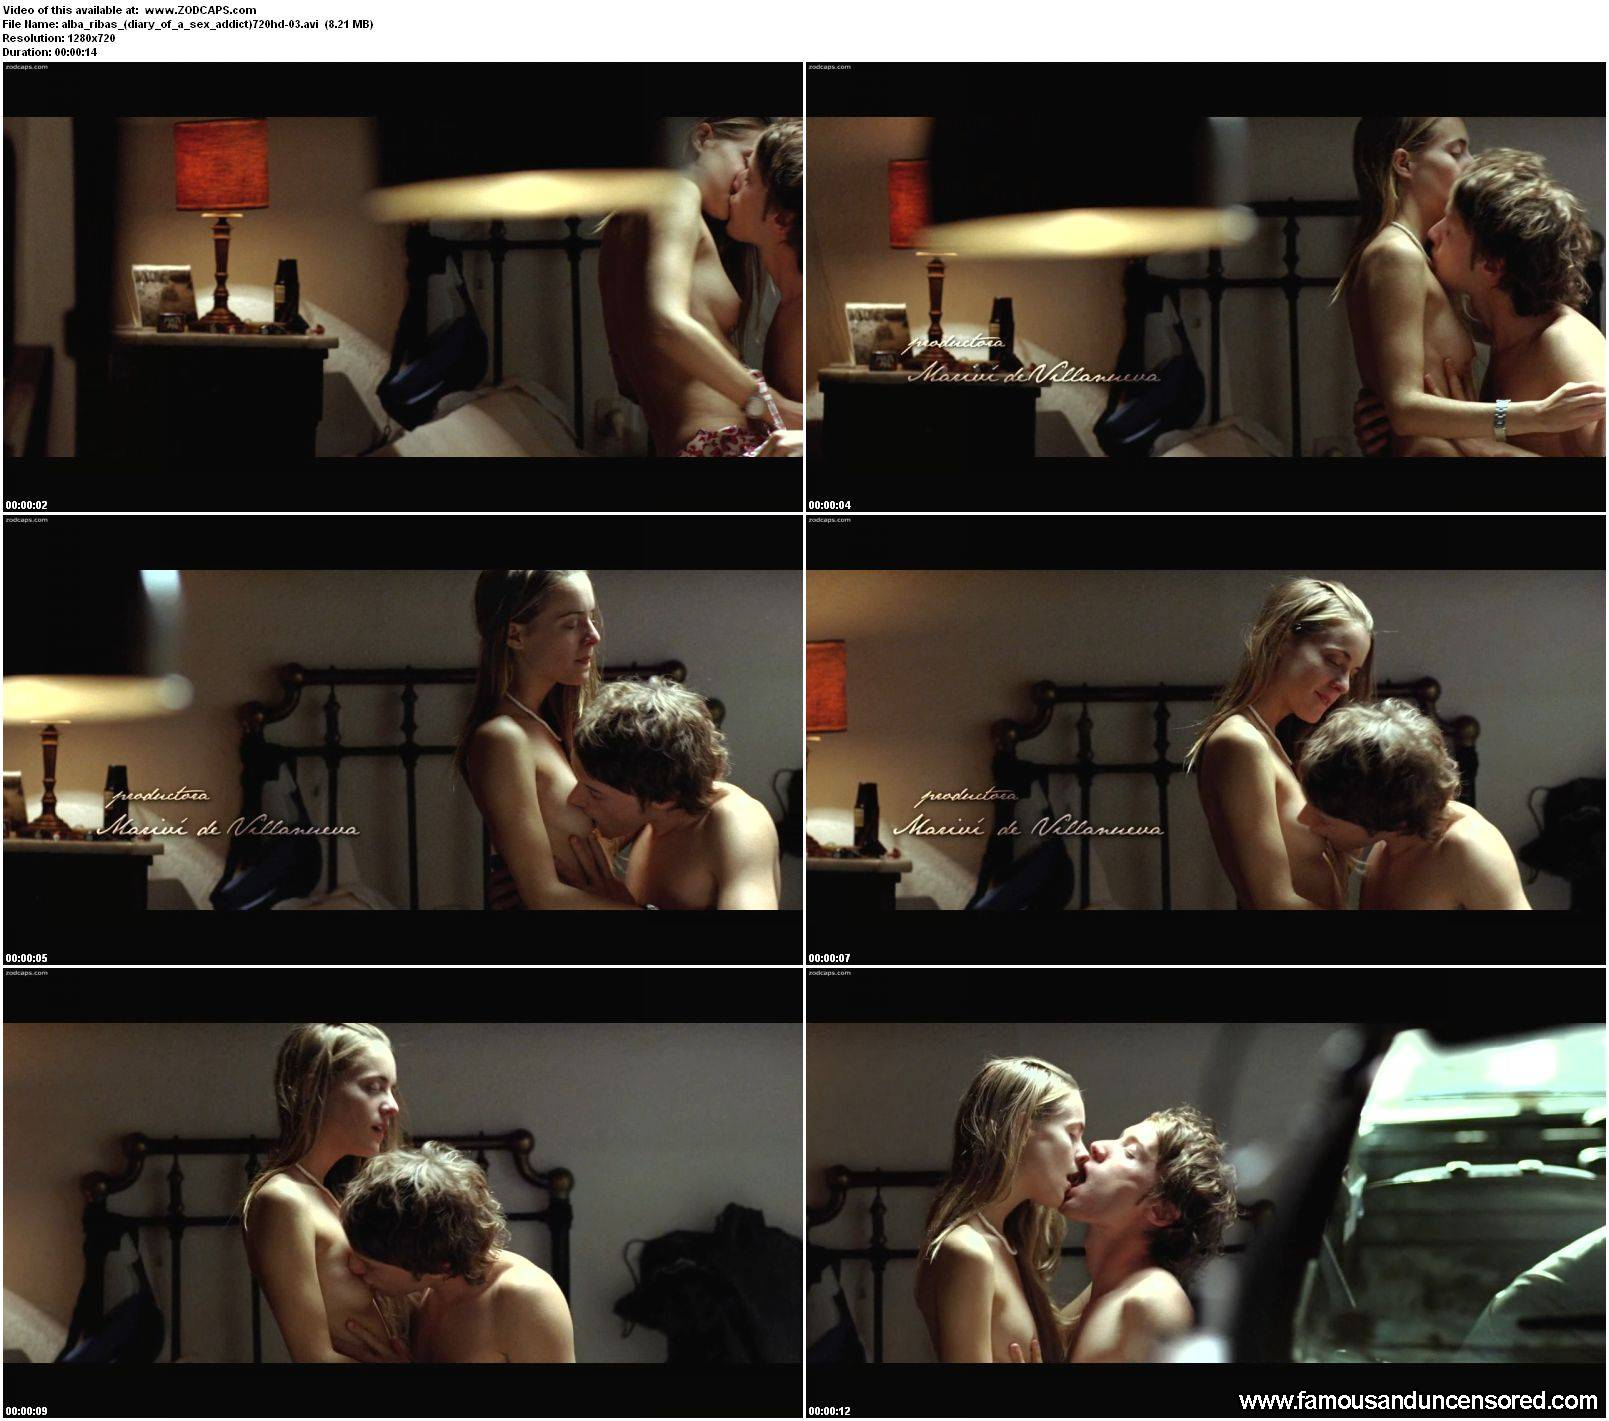 image Alba ribas nude sex scene in diario de una ninfomana movie